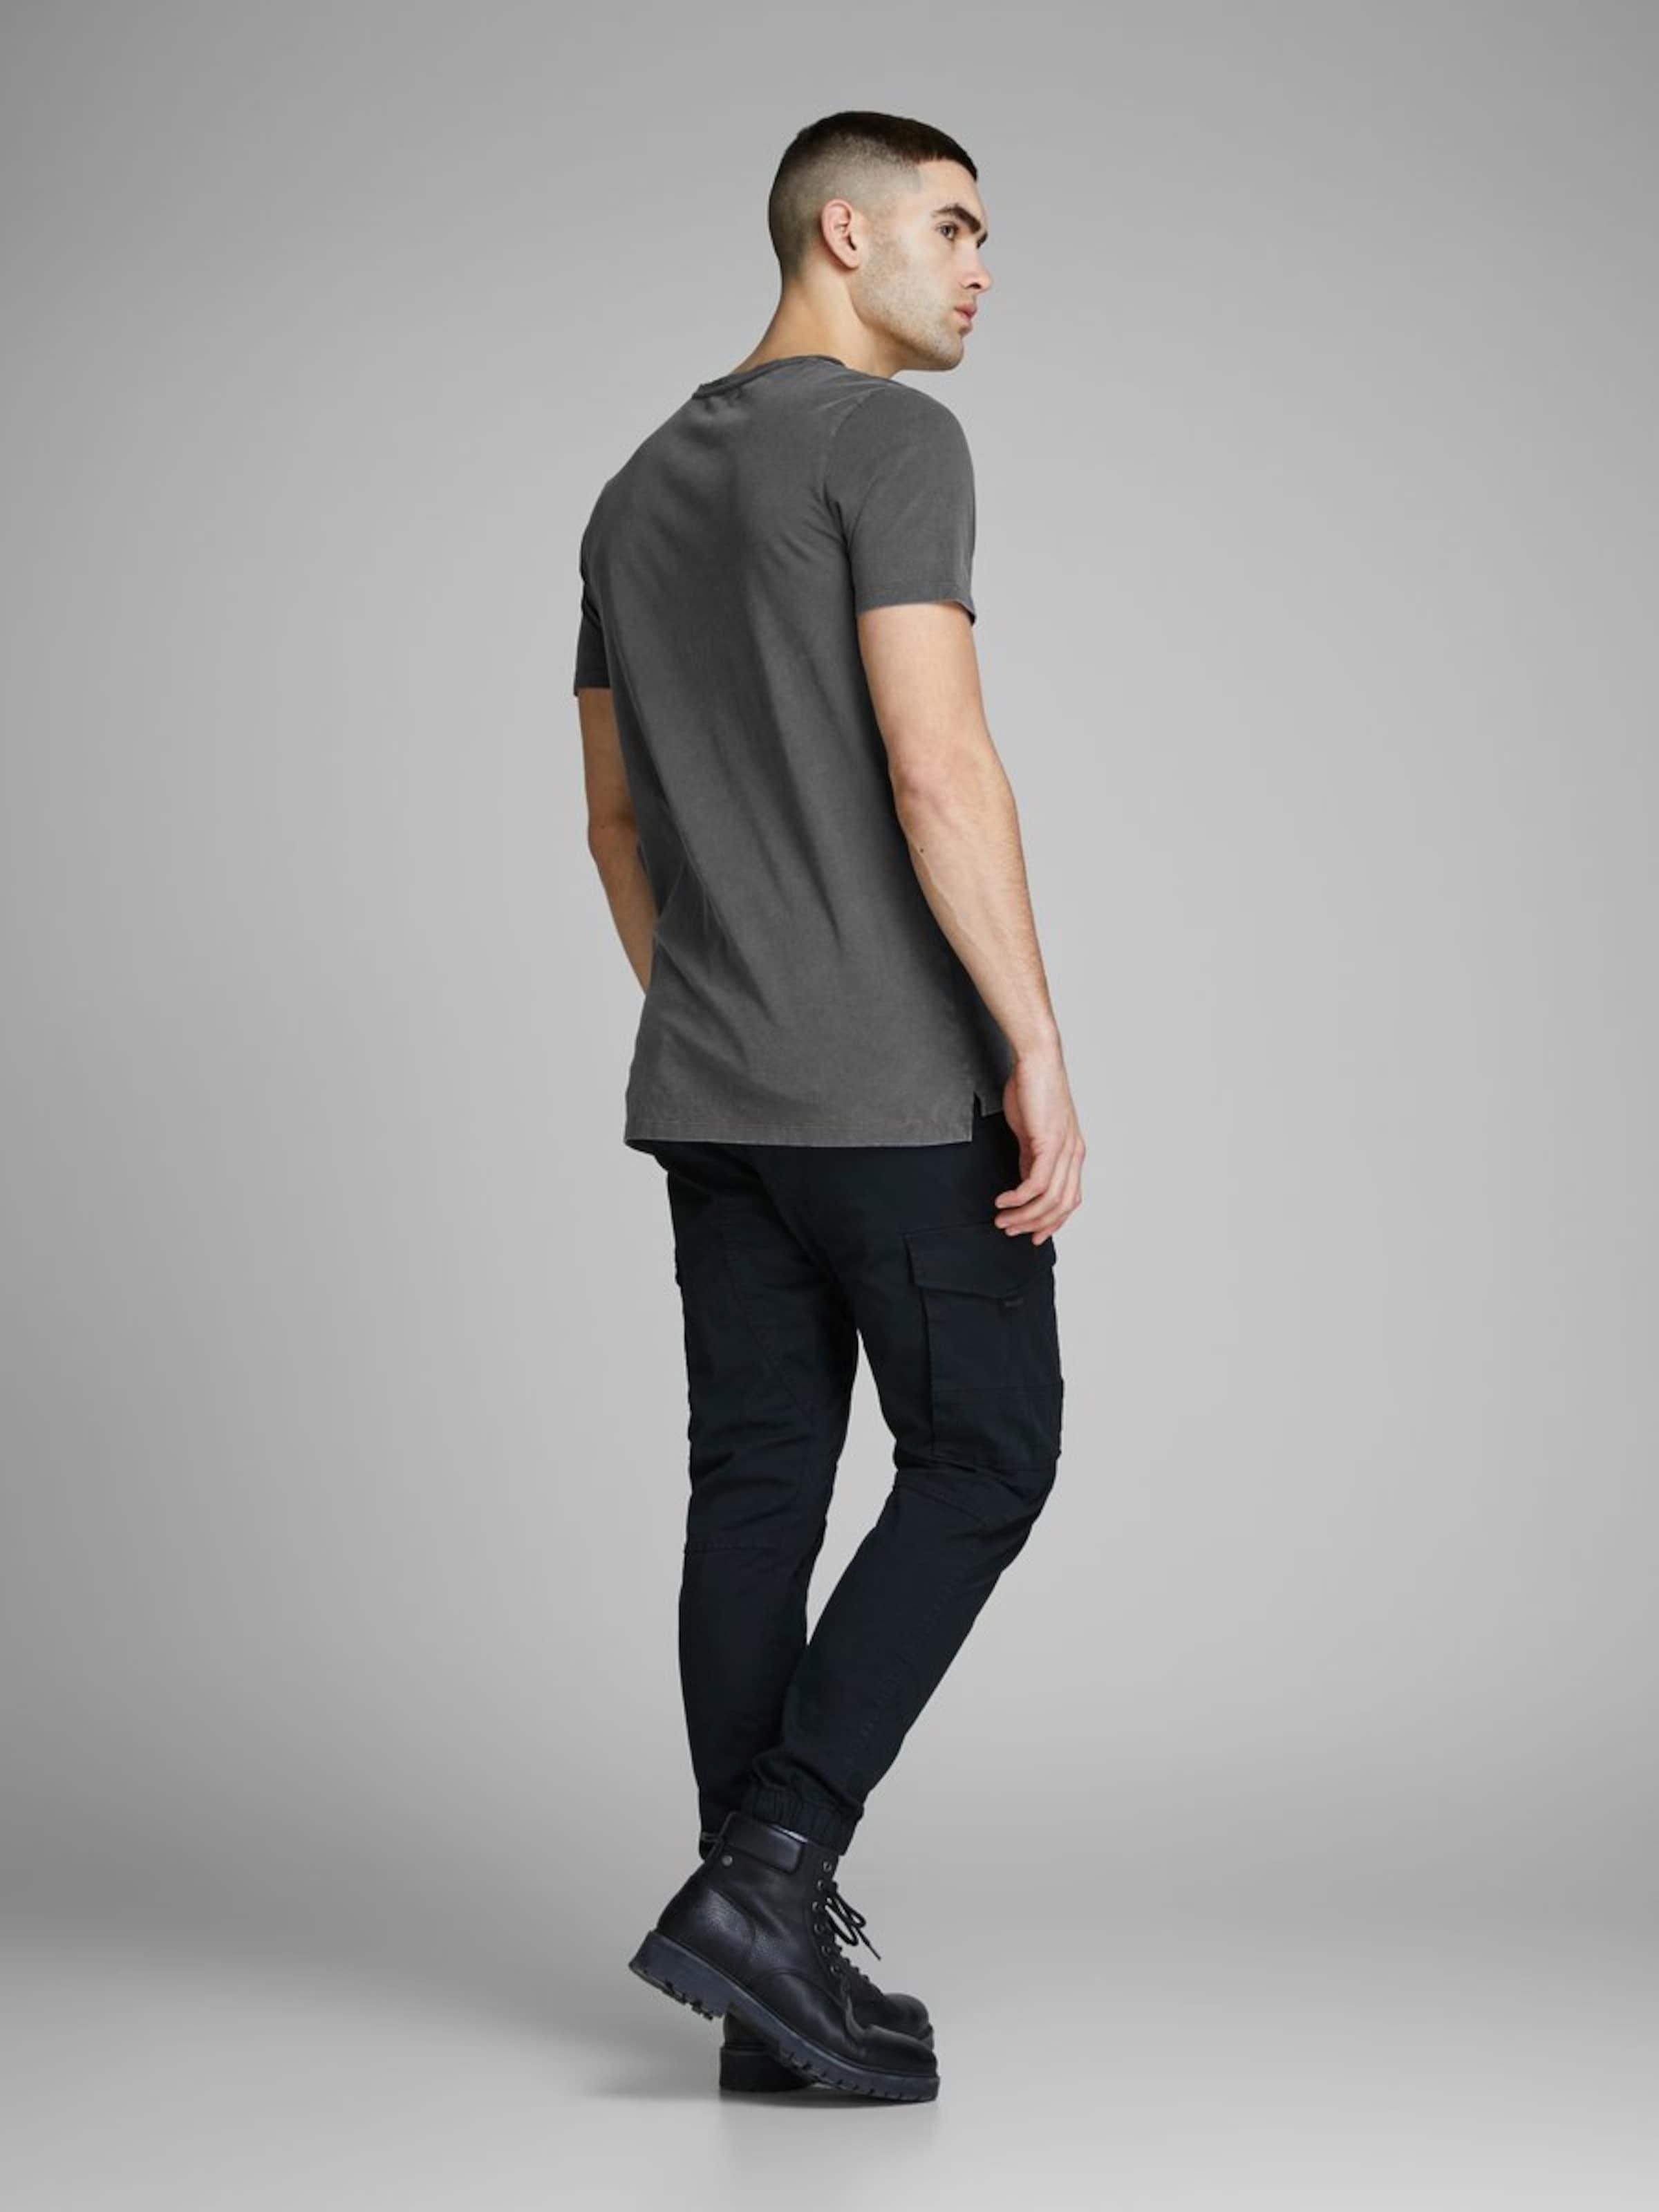 Jackamp; shirt PastelNoir T Rouge Jones En tdQrCxsh